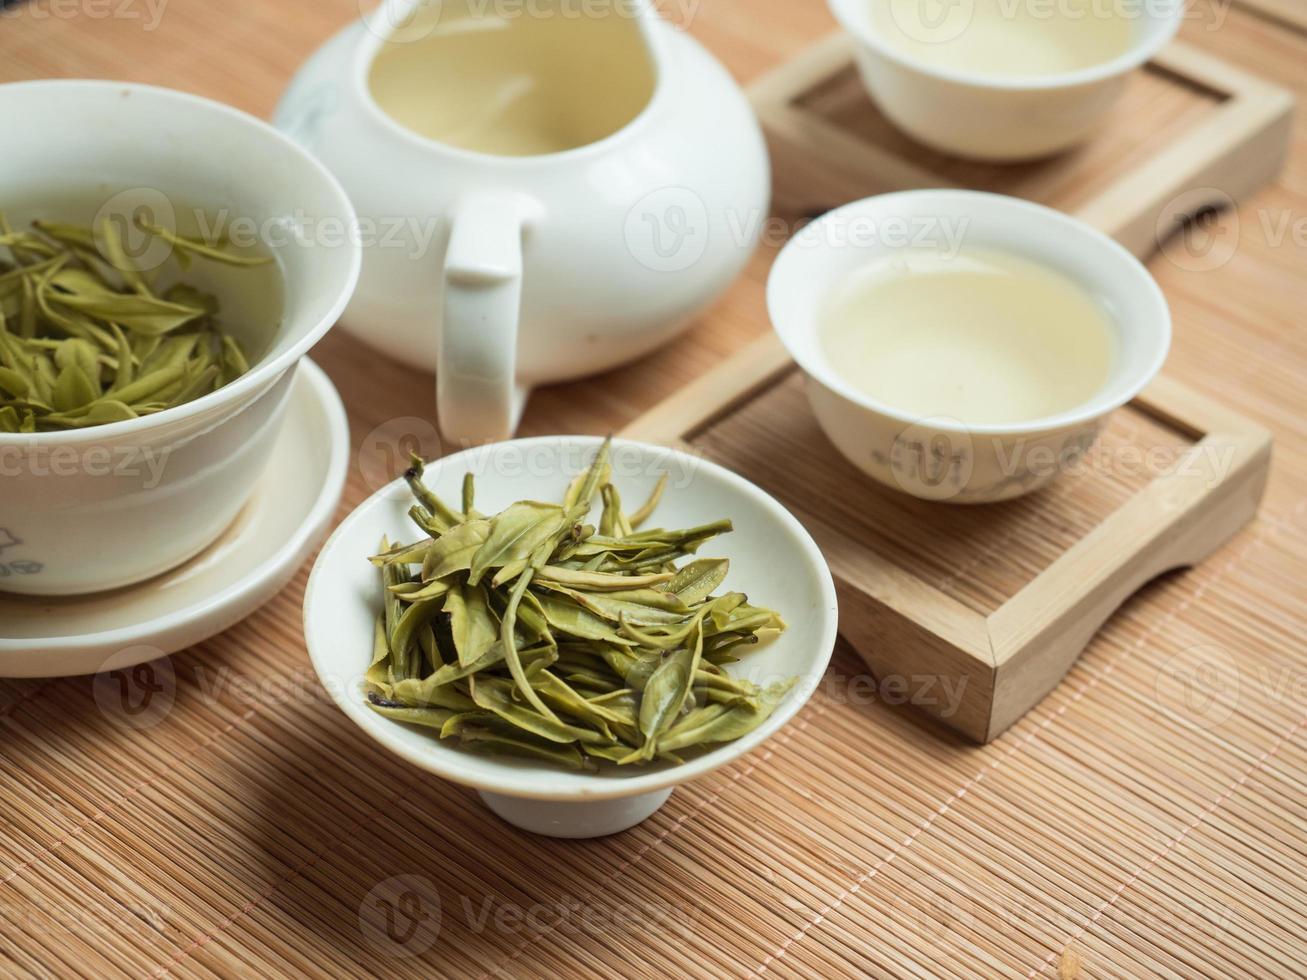 service à thé chinois / service à thé vert photo